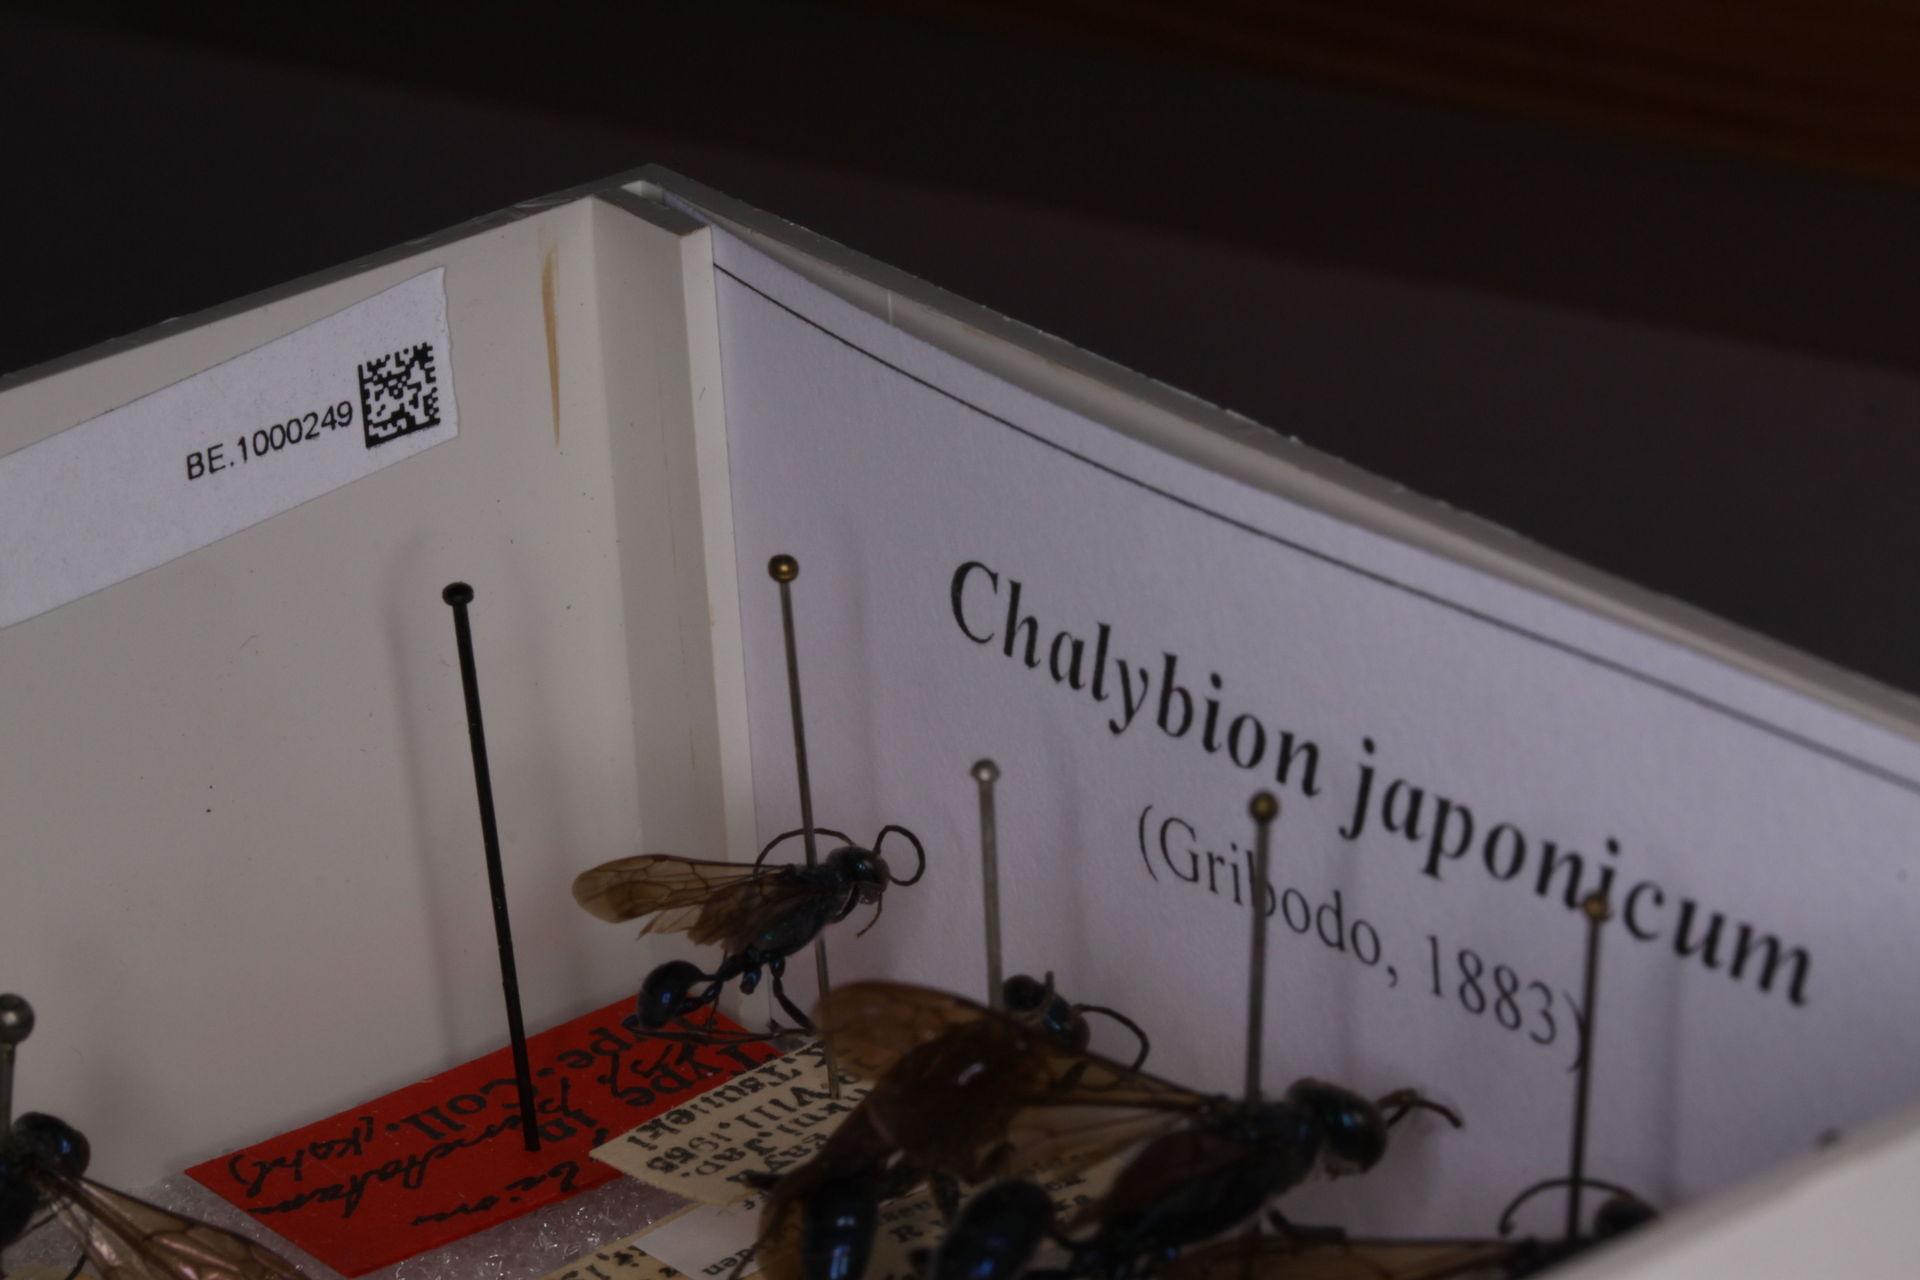 RMNH.INS.591473   Chalybion japonicum (Gridobo, 1883)